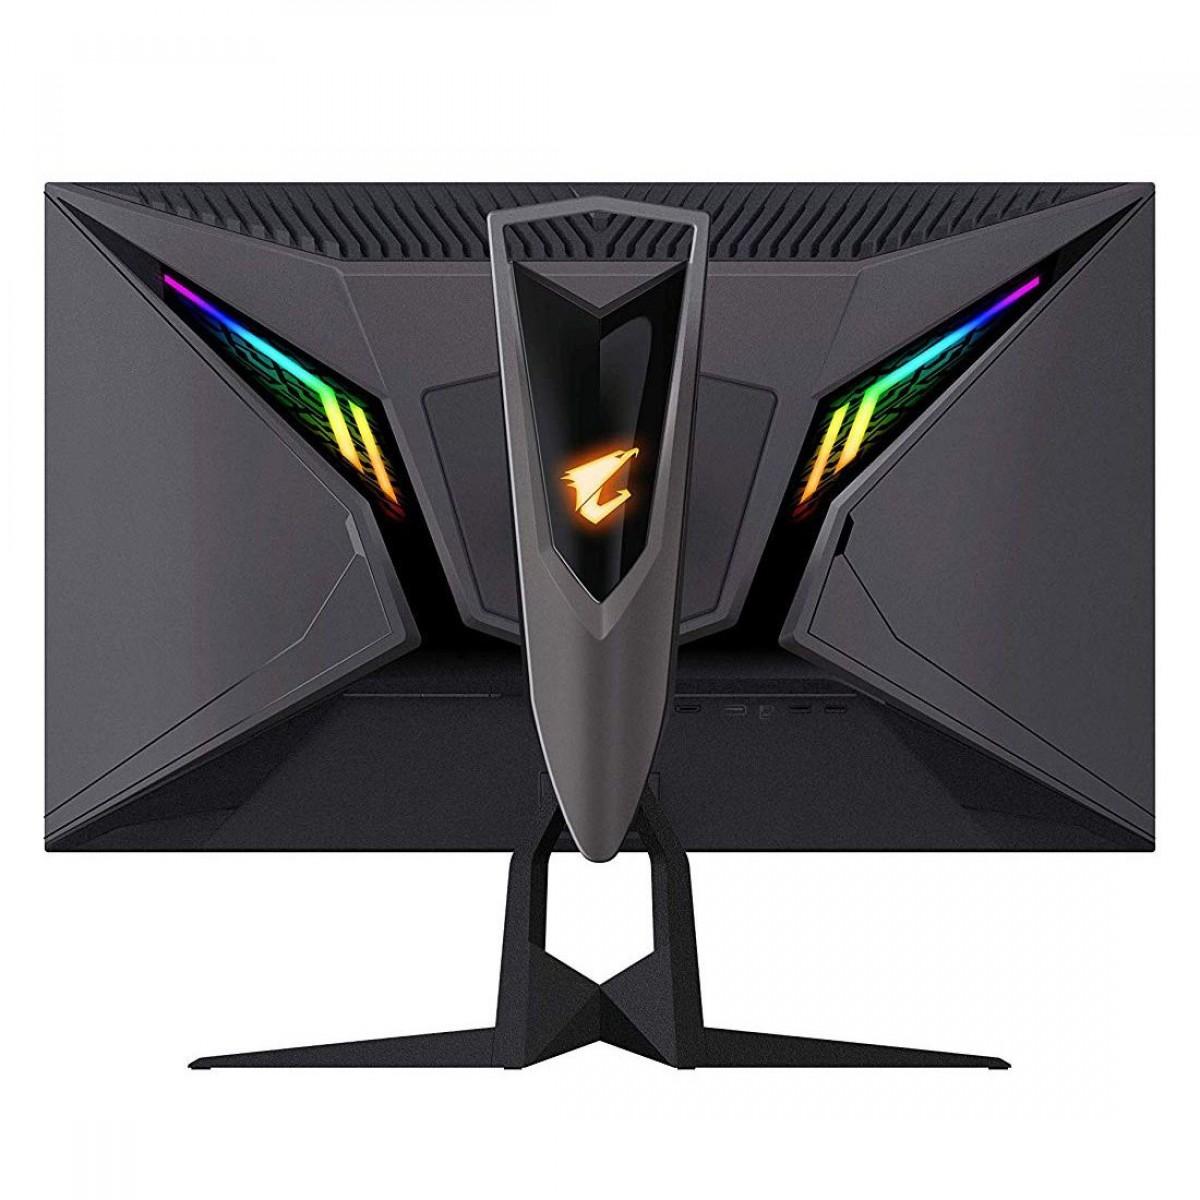 Monitor Gamer Gigabyte Aorus 27 Pol RGB, QHD, 144Hz, 1ms, FreeSync, AORUS AD27QD-AS